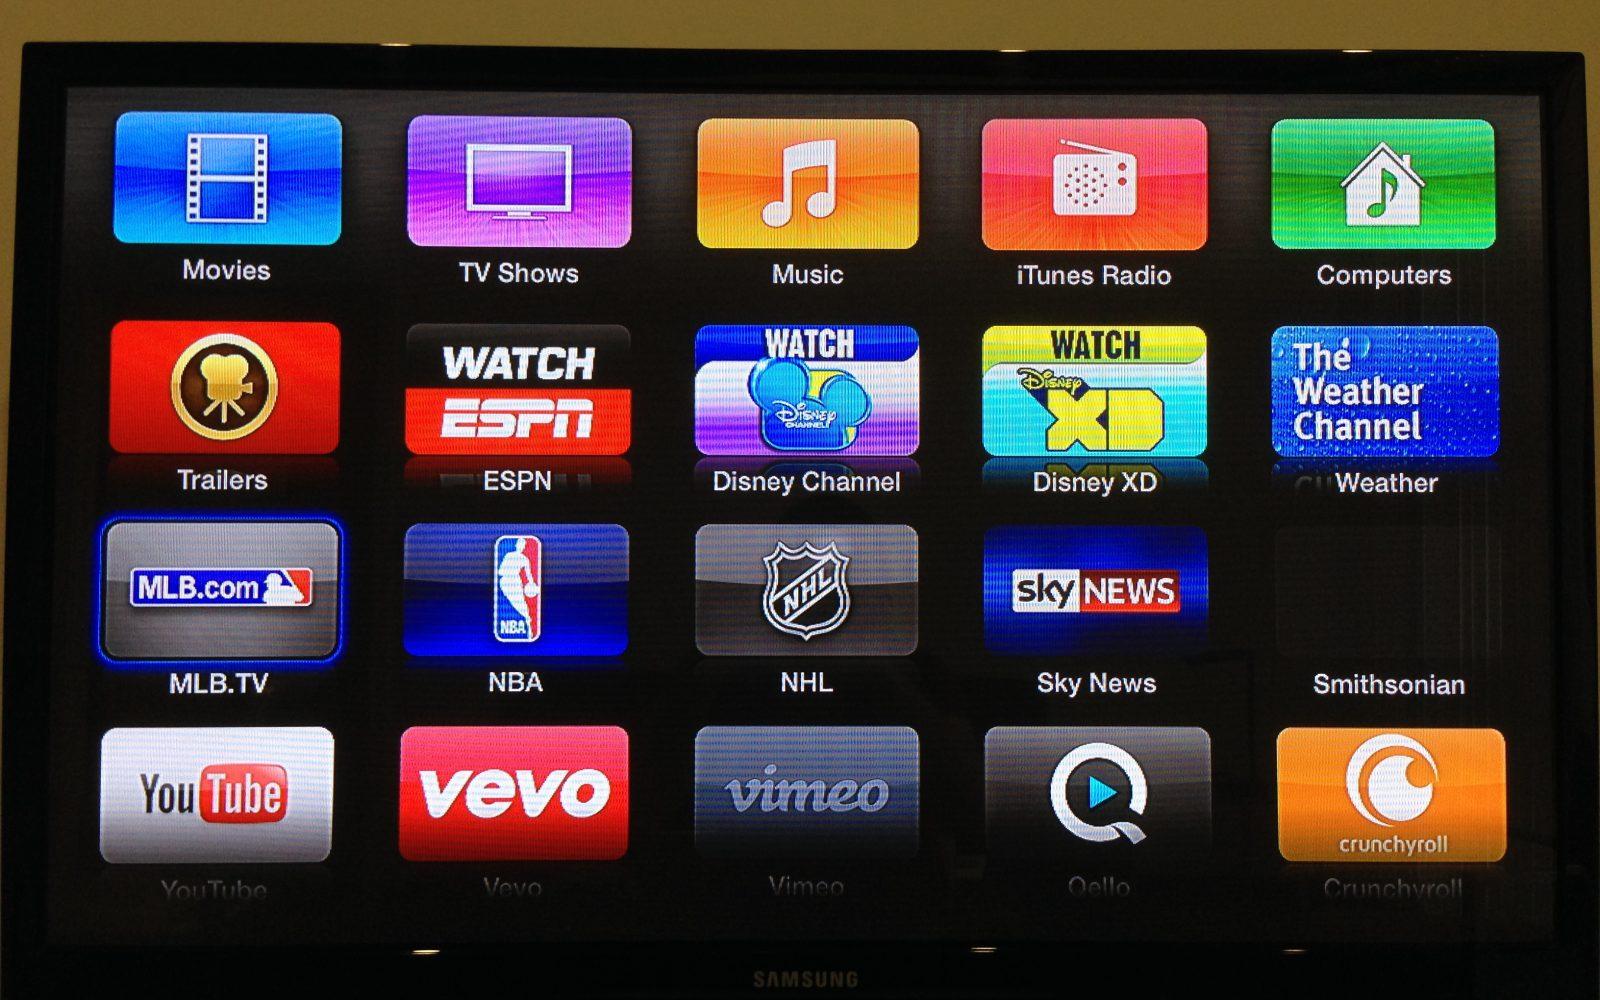 Apple TV updated with Vevo, Disney Channel, Disney XD